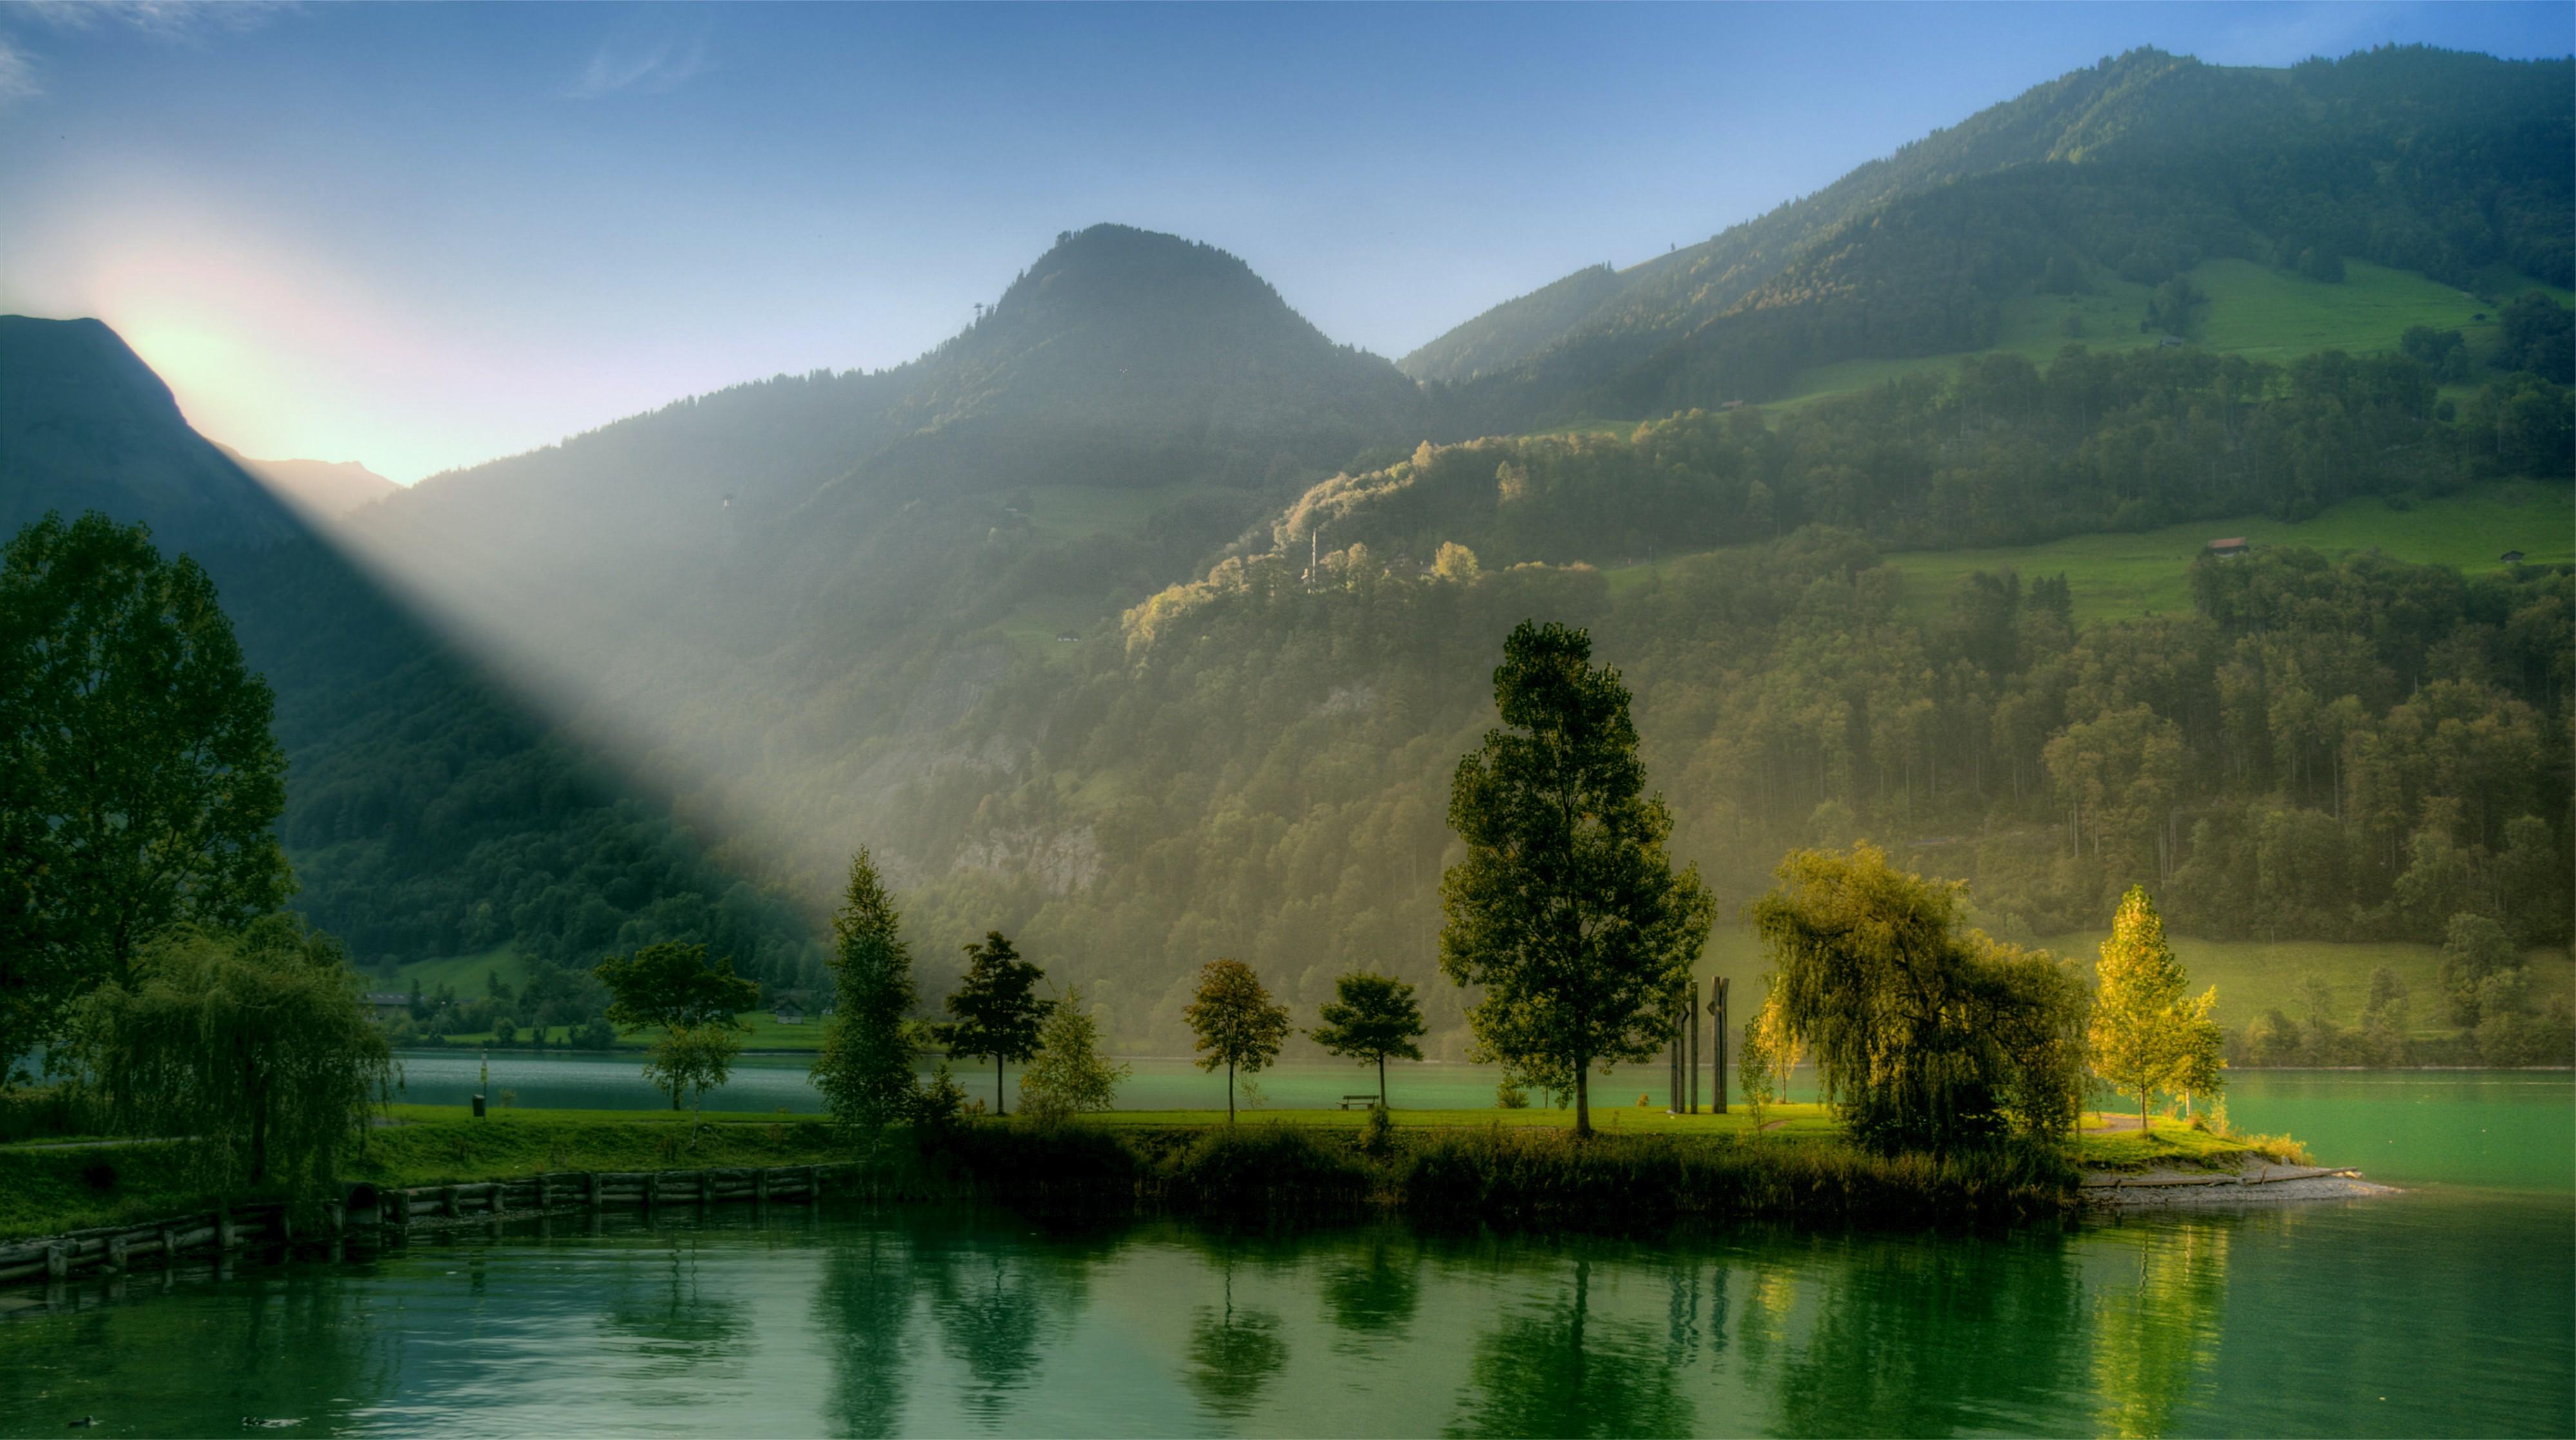 800x384 Wallpaper Nature Hd: Best HD Nature Wallpapers For Your Desktop And Smartphones